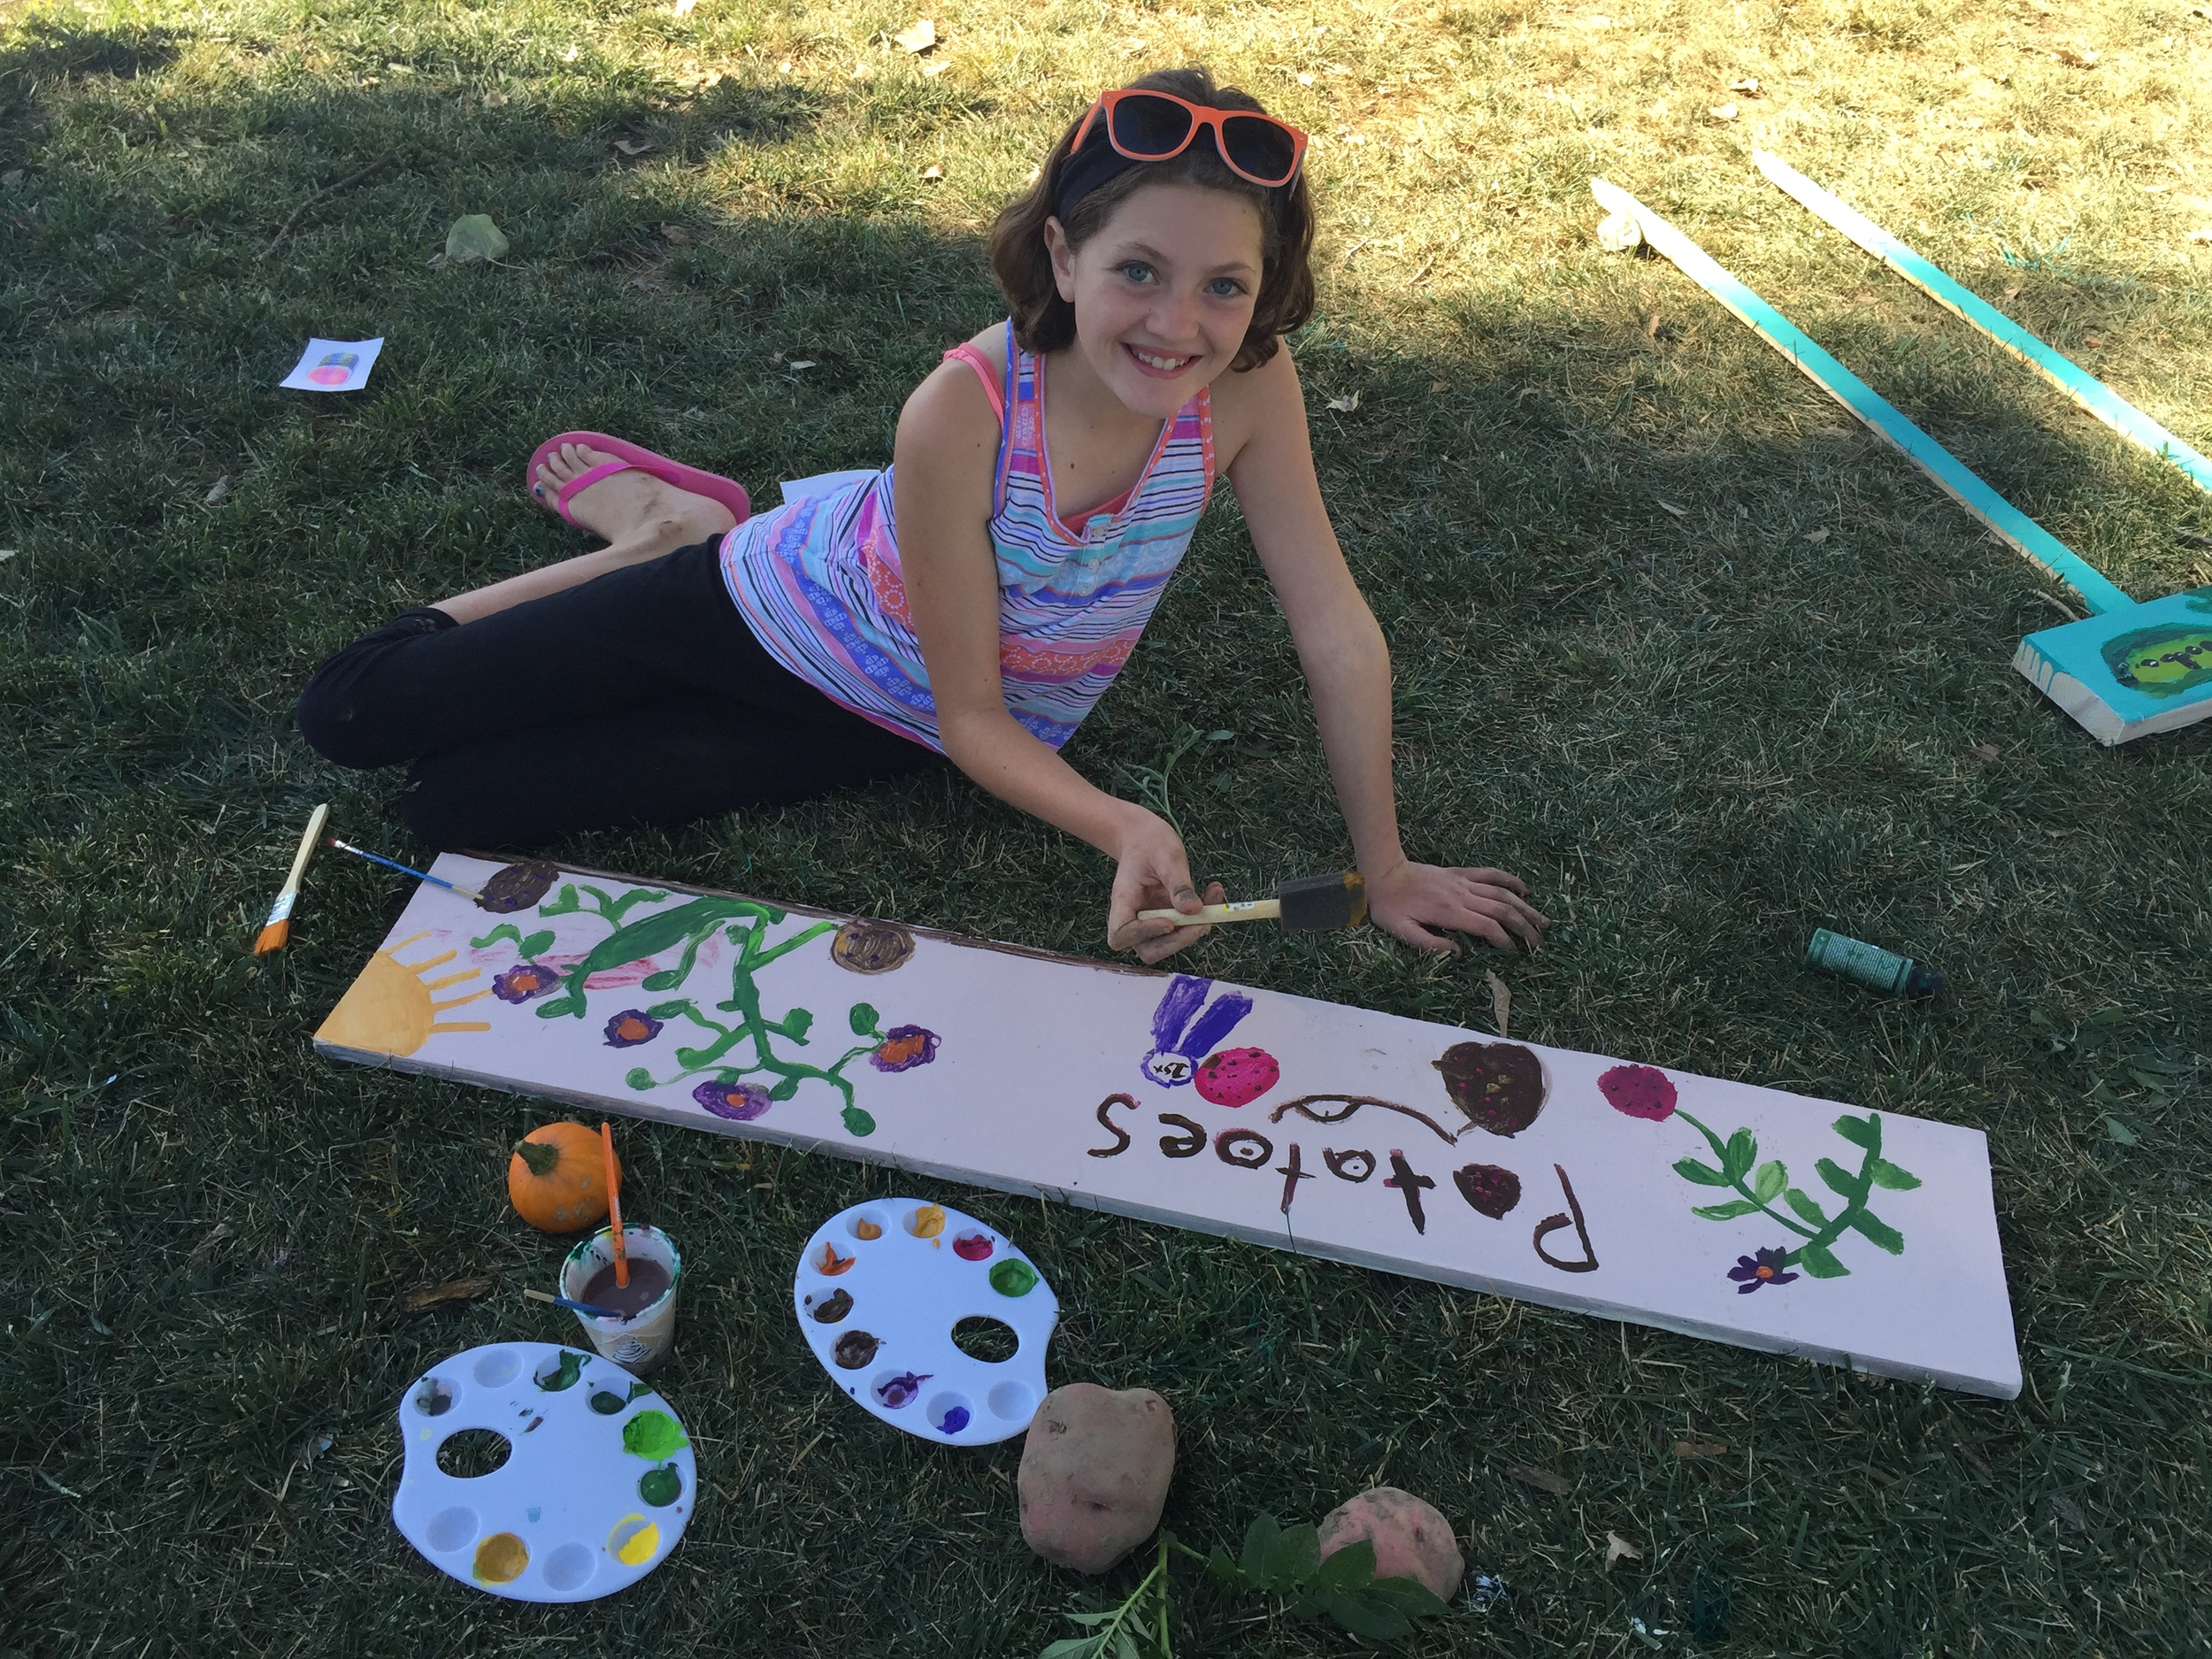 Garden Club Sign Painting 2015-09-25 053.JPG